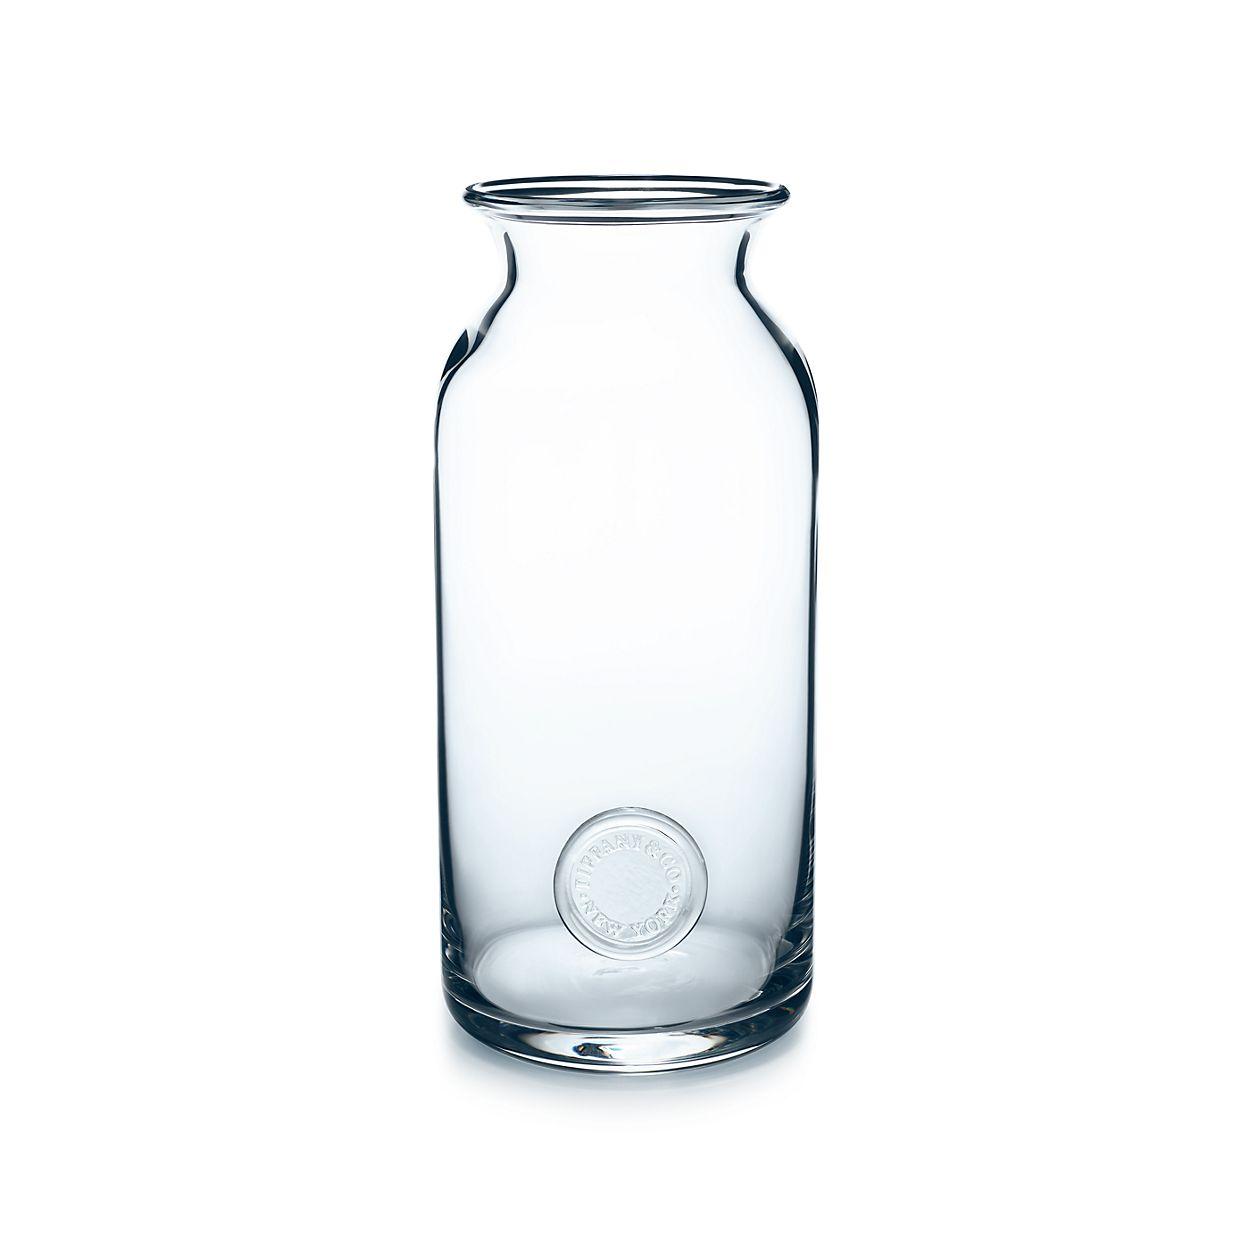 Tiffany seal vase in lead crystal small tiffany co tiffany sealvase tiffany sealvase reviewsmspy